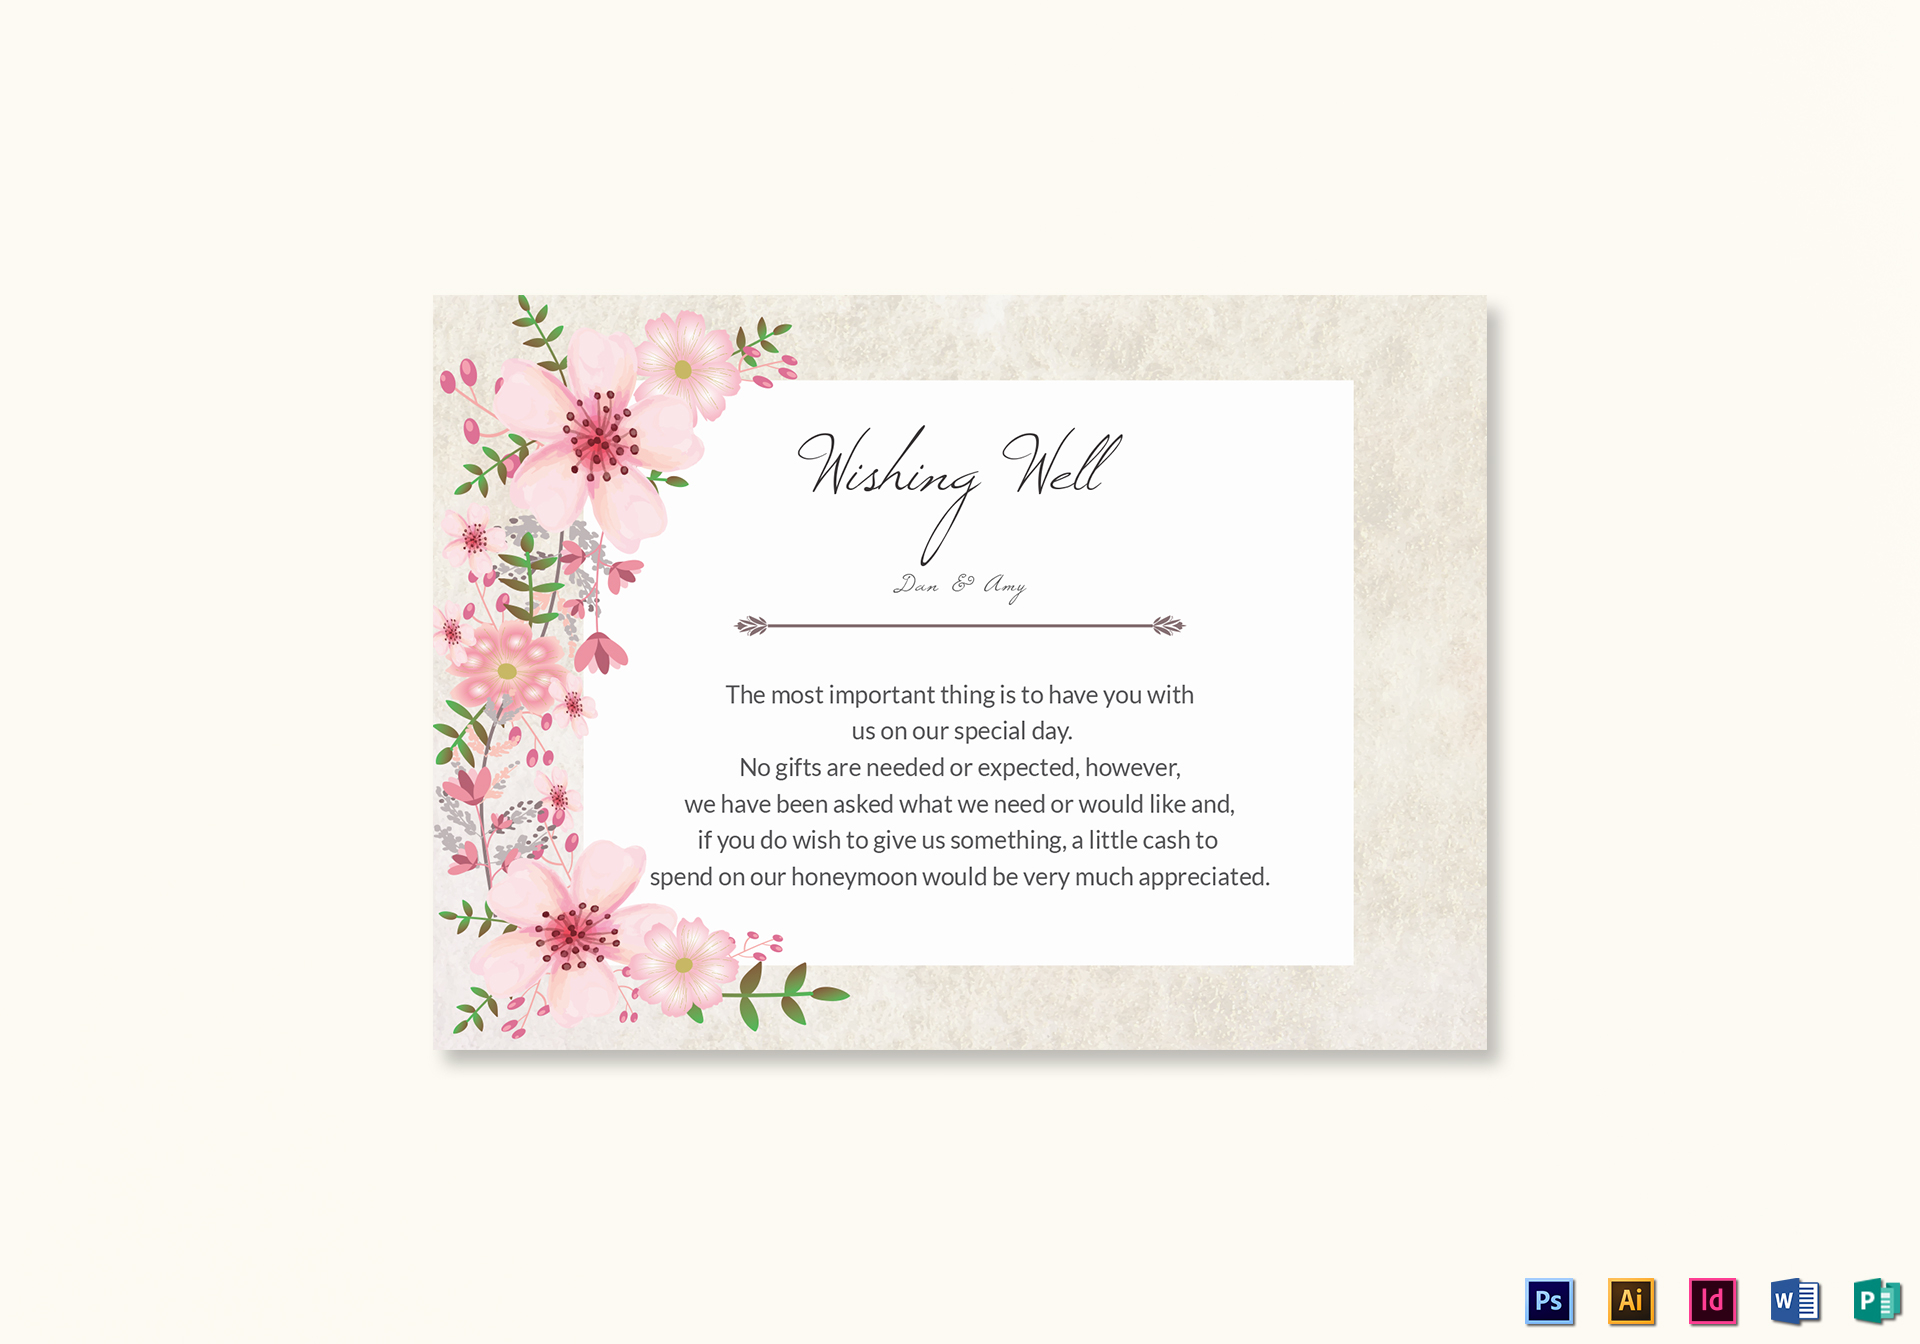 Pink Fl Wishing Well Card Template